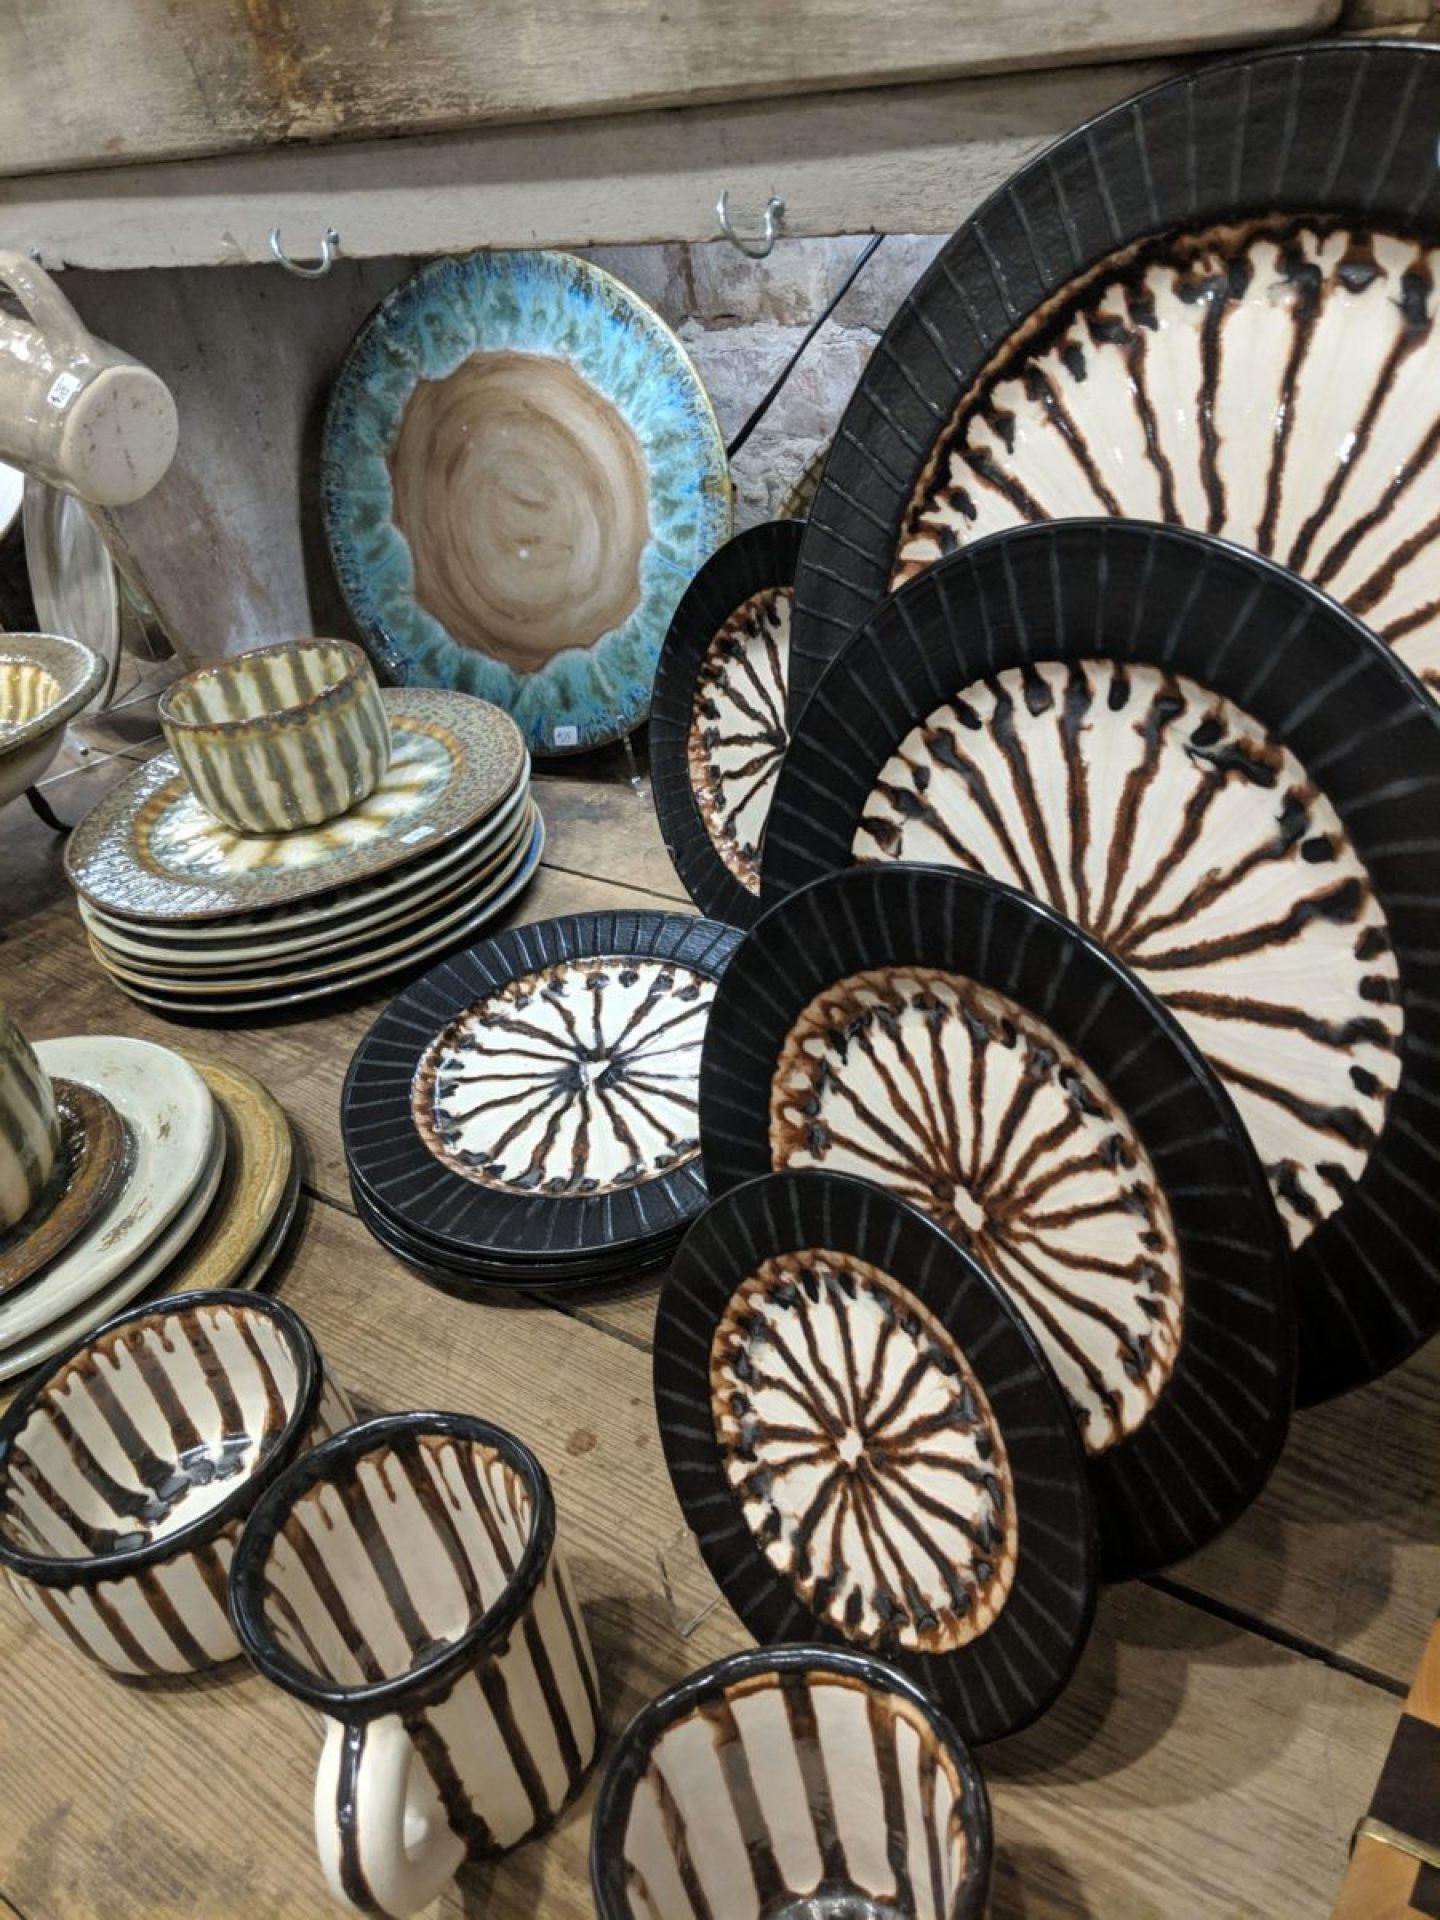 IMG_20190502_190709-1440x1920 Arkansas Delta Family Road Trip:  Black Heritage, Art & More!